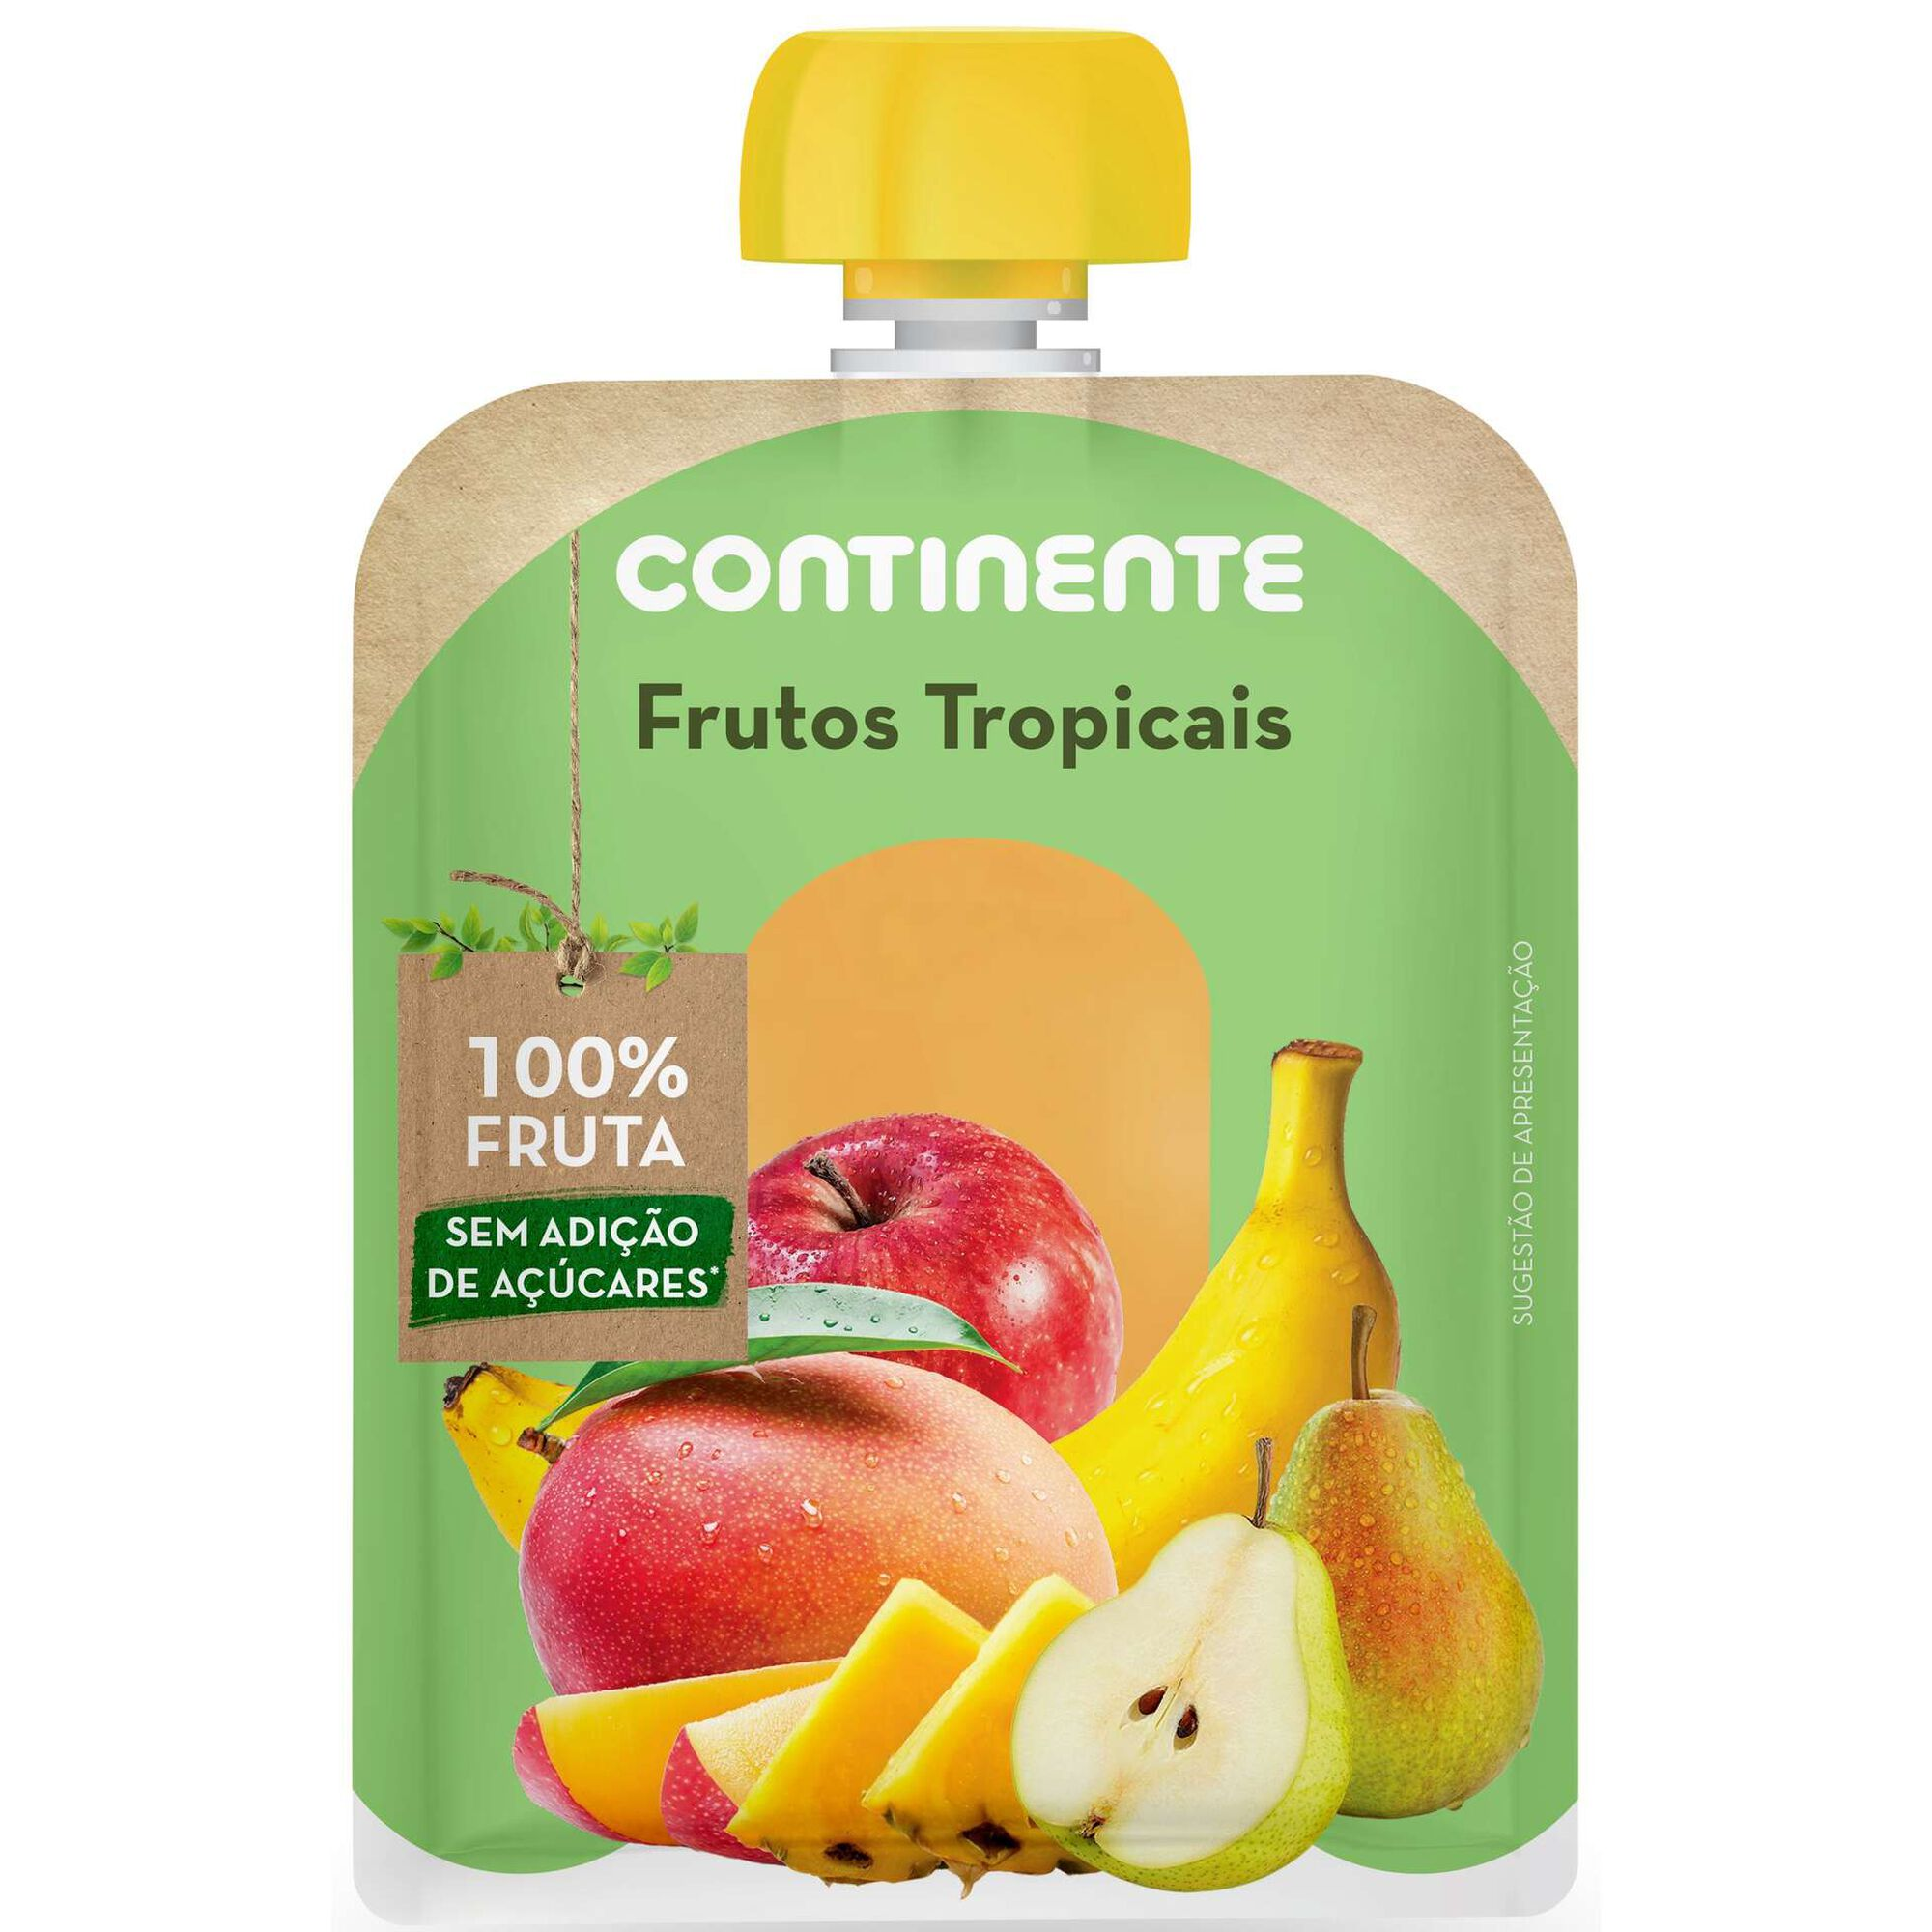 Saqueta de Frutos Tropicais